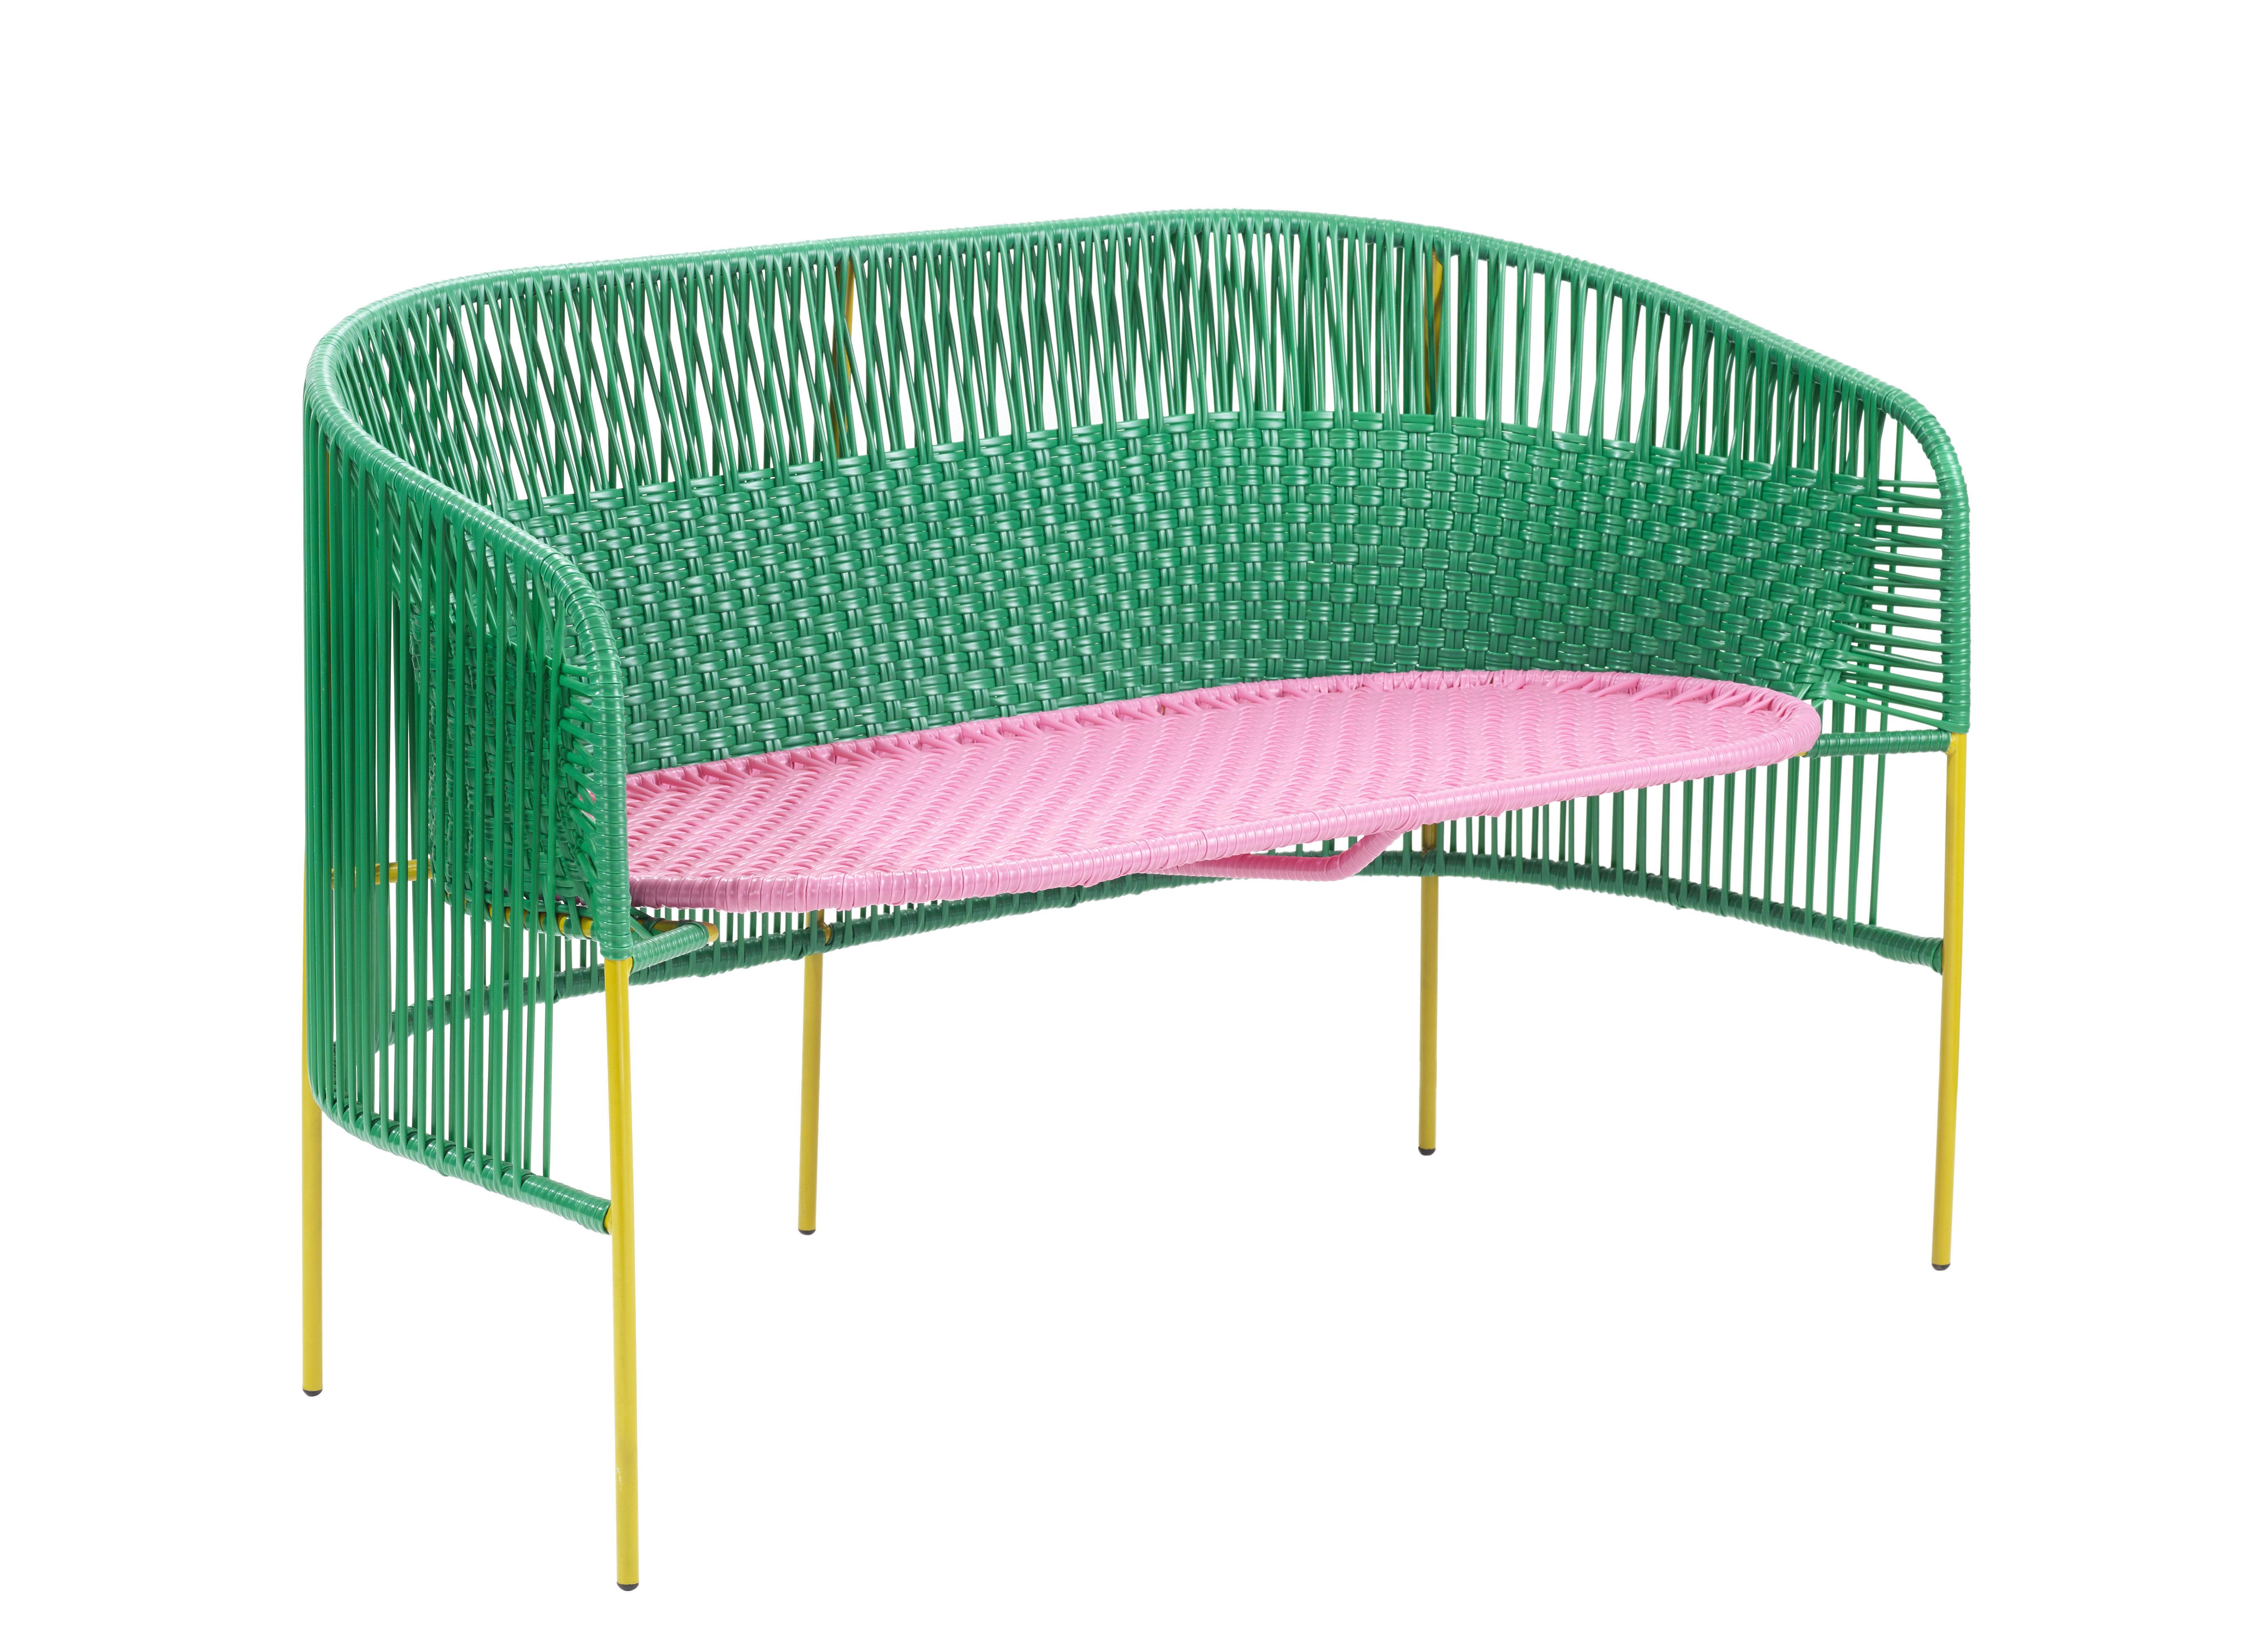 Möbel - Sofas - Caribe Sofa 2 Sitze / 2-Sitzer - L 115 cm - ames - Grün & rosa / Stuhlbeine curry - Recycelte Kunststoffdrähte, Thermolackierter verzinkter Stahl